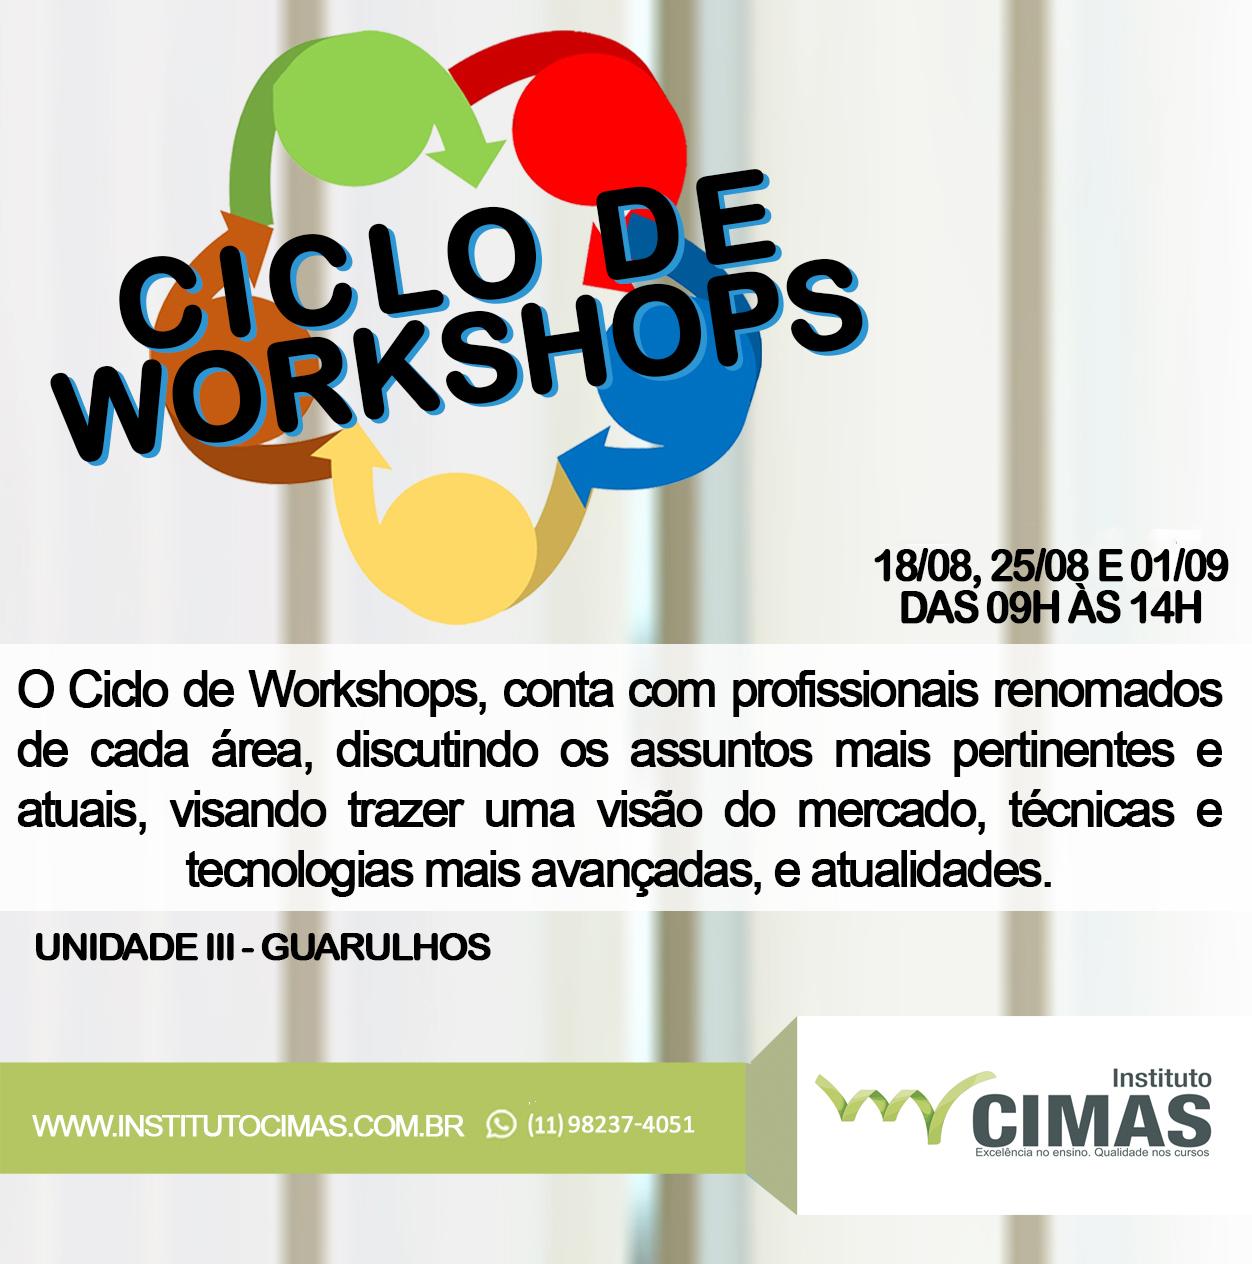 Ciclo de Workshops